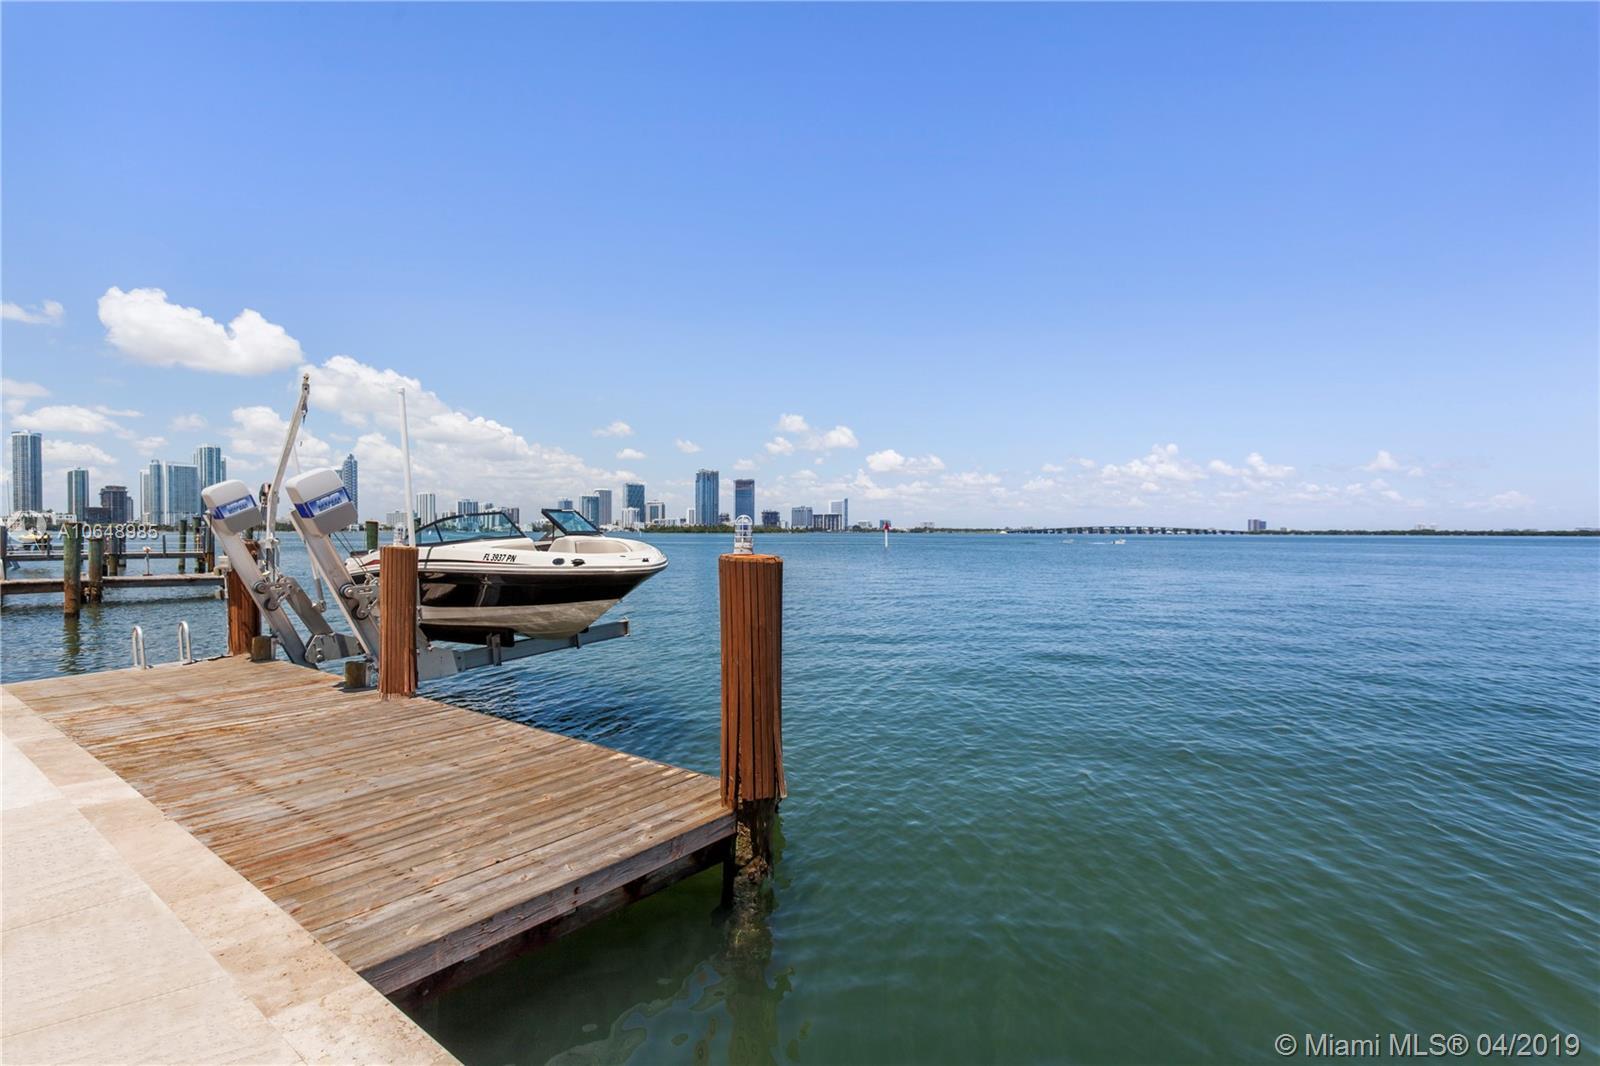 1315 N Venetian Way, Miami, FL 33139